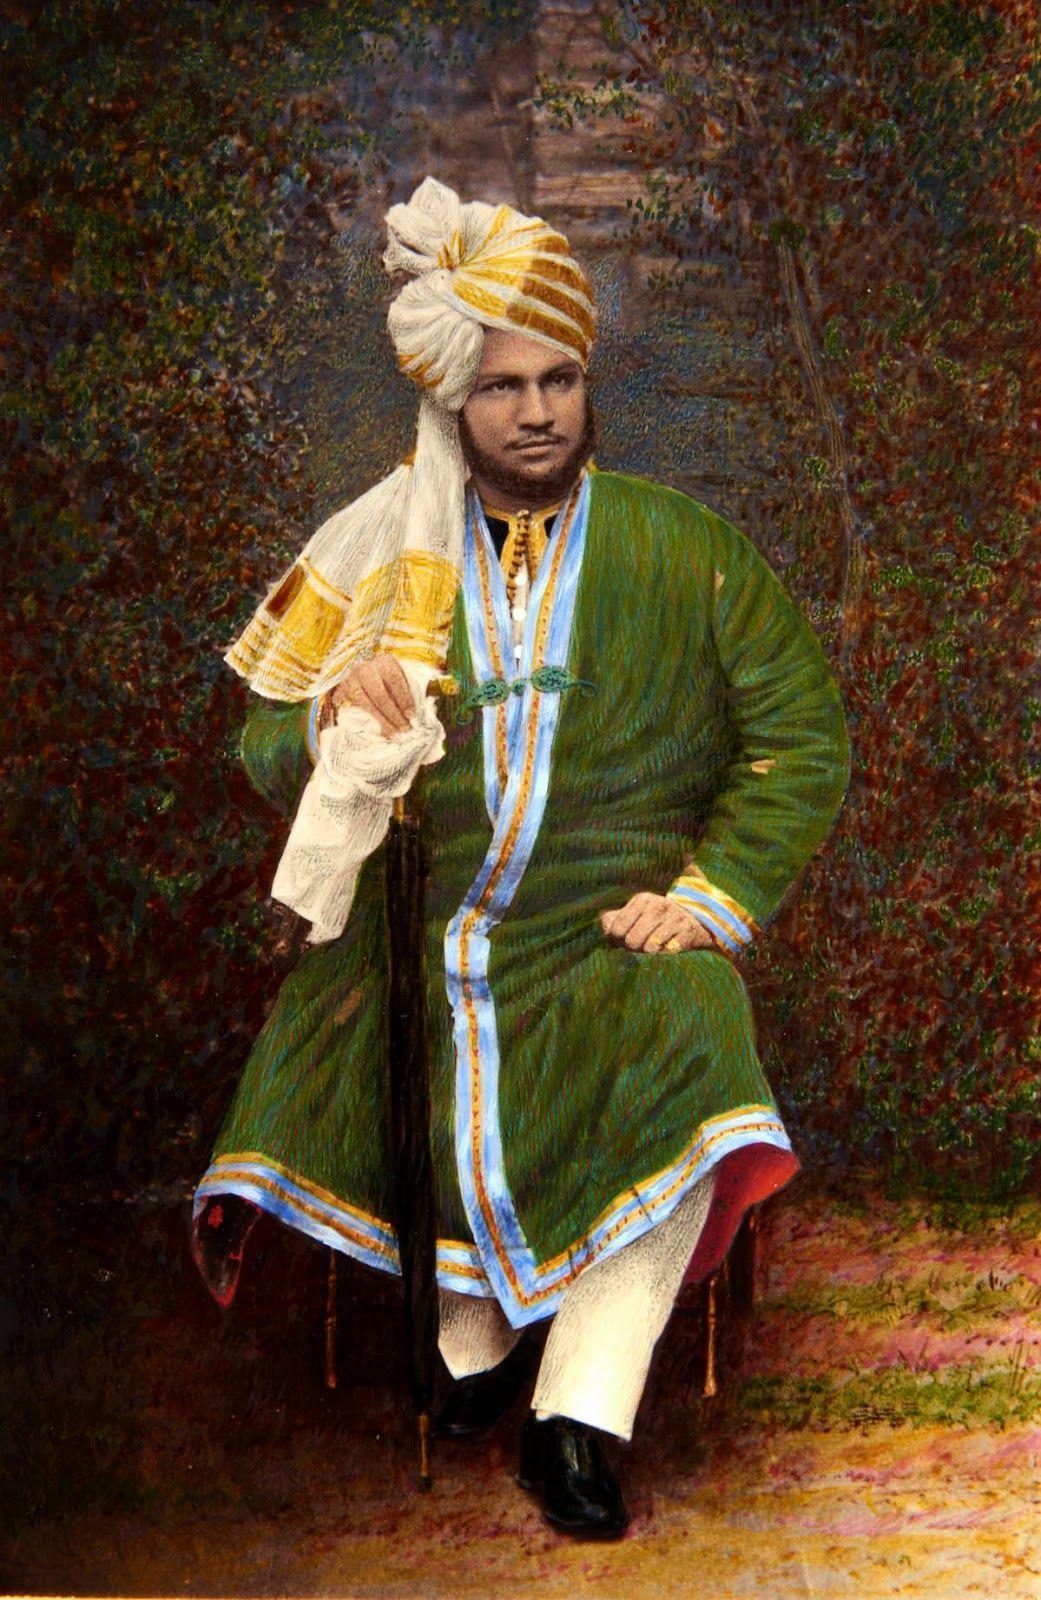 Hafiz Mohammed Abdul Karim Cie Cvo 1863 1909 Known As The Munshi Was An Indian Muslim Queen Victoria Queen Victoria Family Queen Victoria Prince Albert